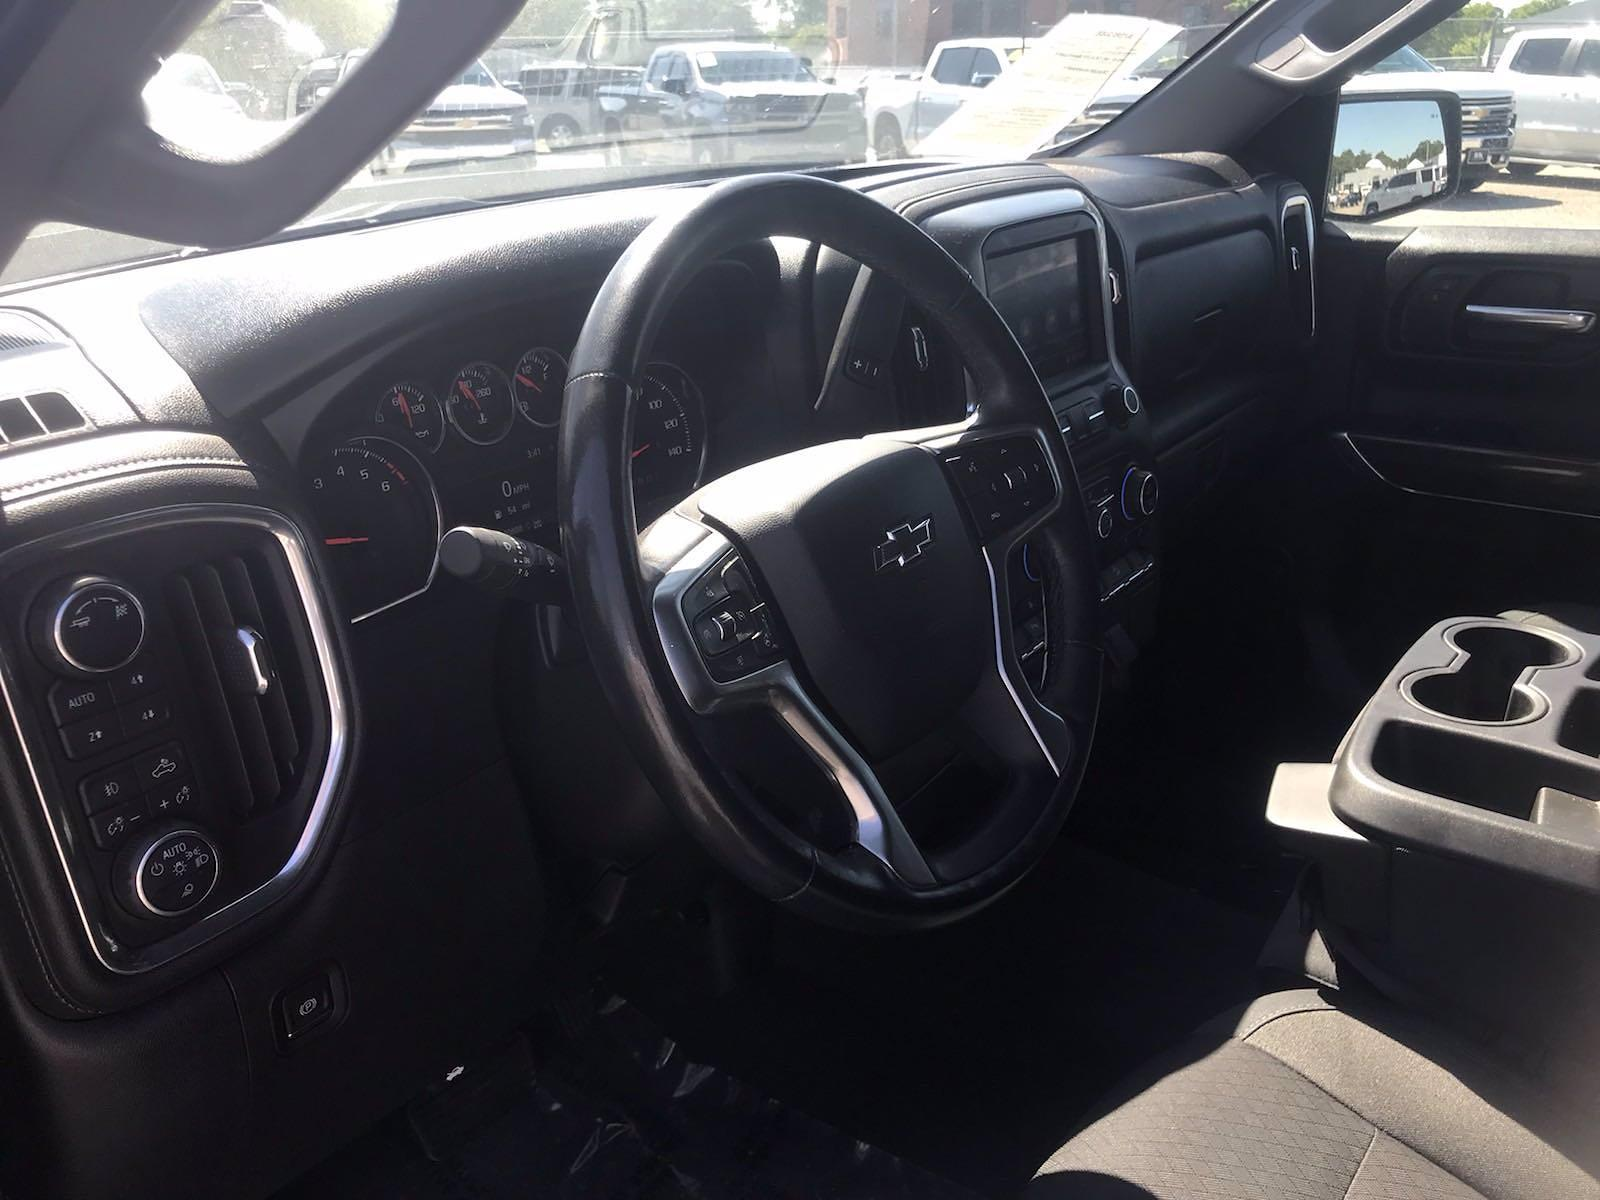 2019 Chevrolet Silverado 1500 Crew Cab 4x4, Pickup #16509P - photo 24